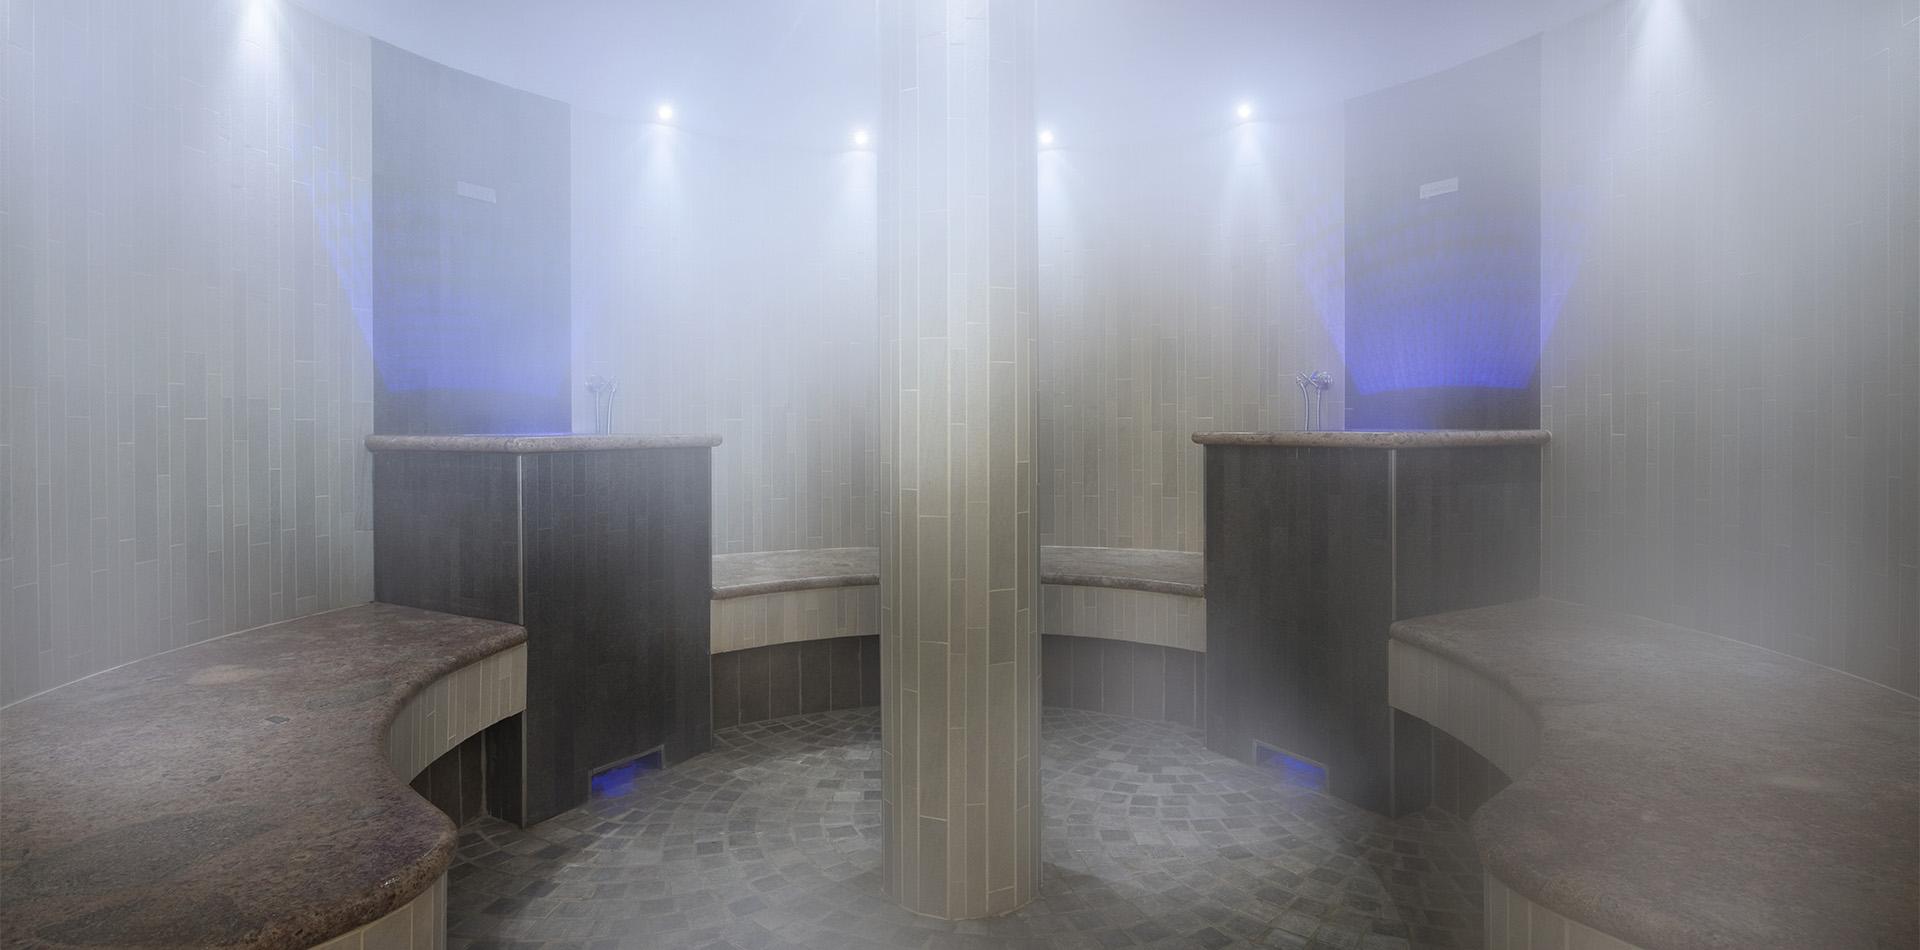 bagno di vapore ASSP 8